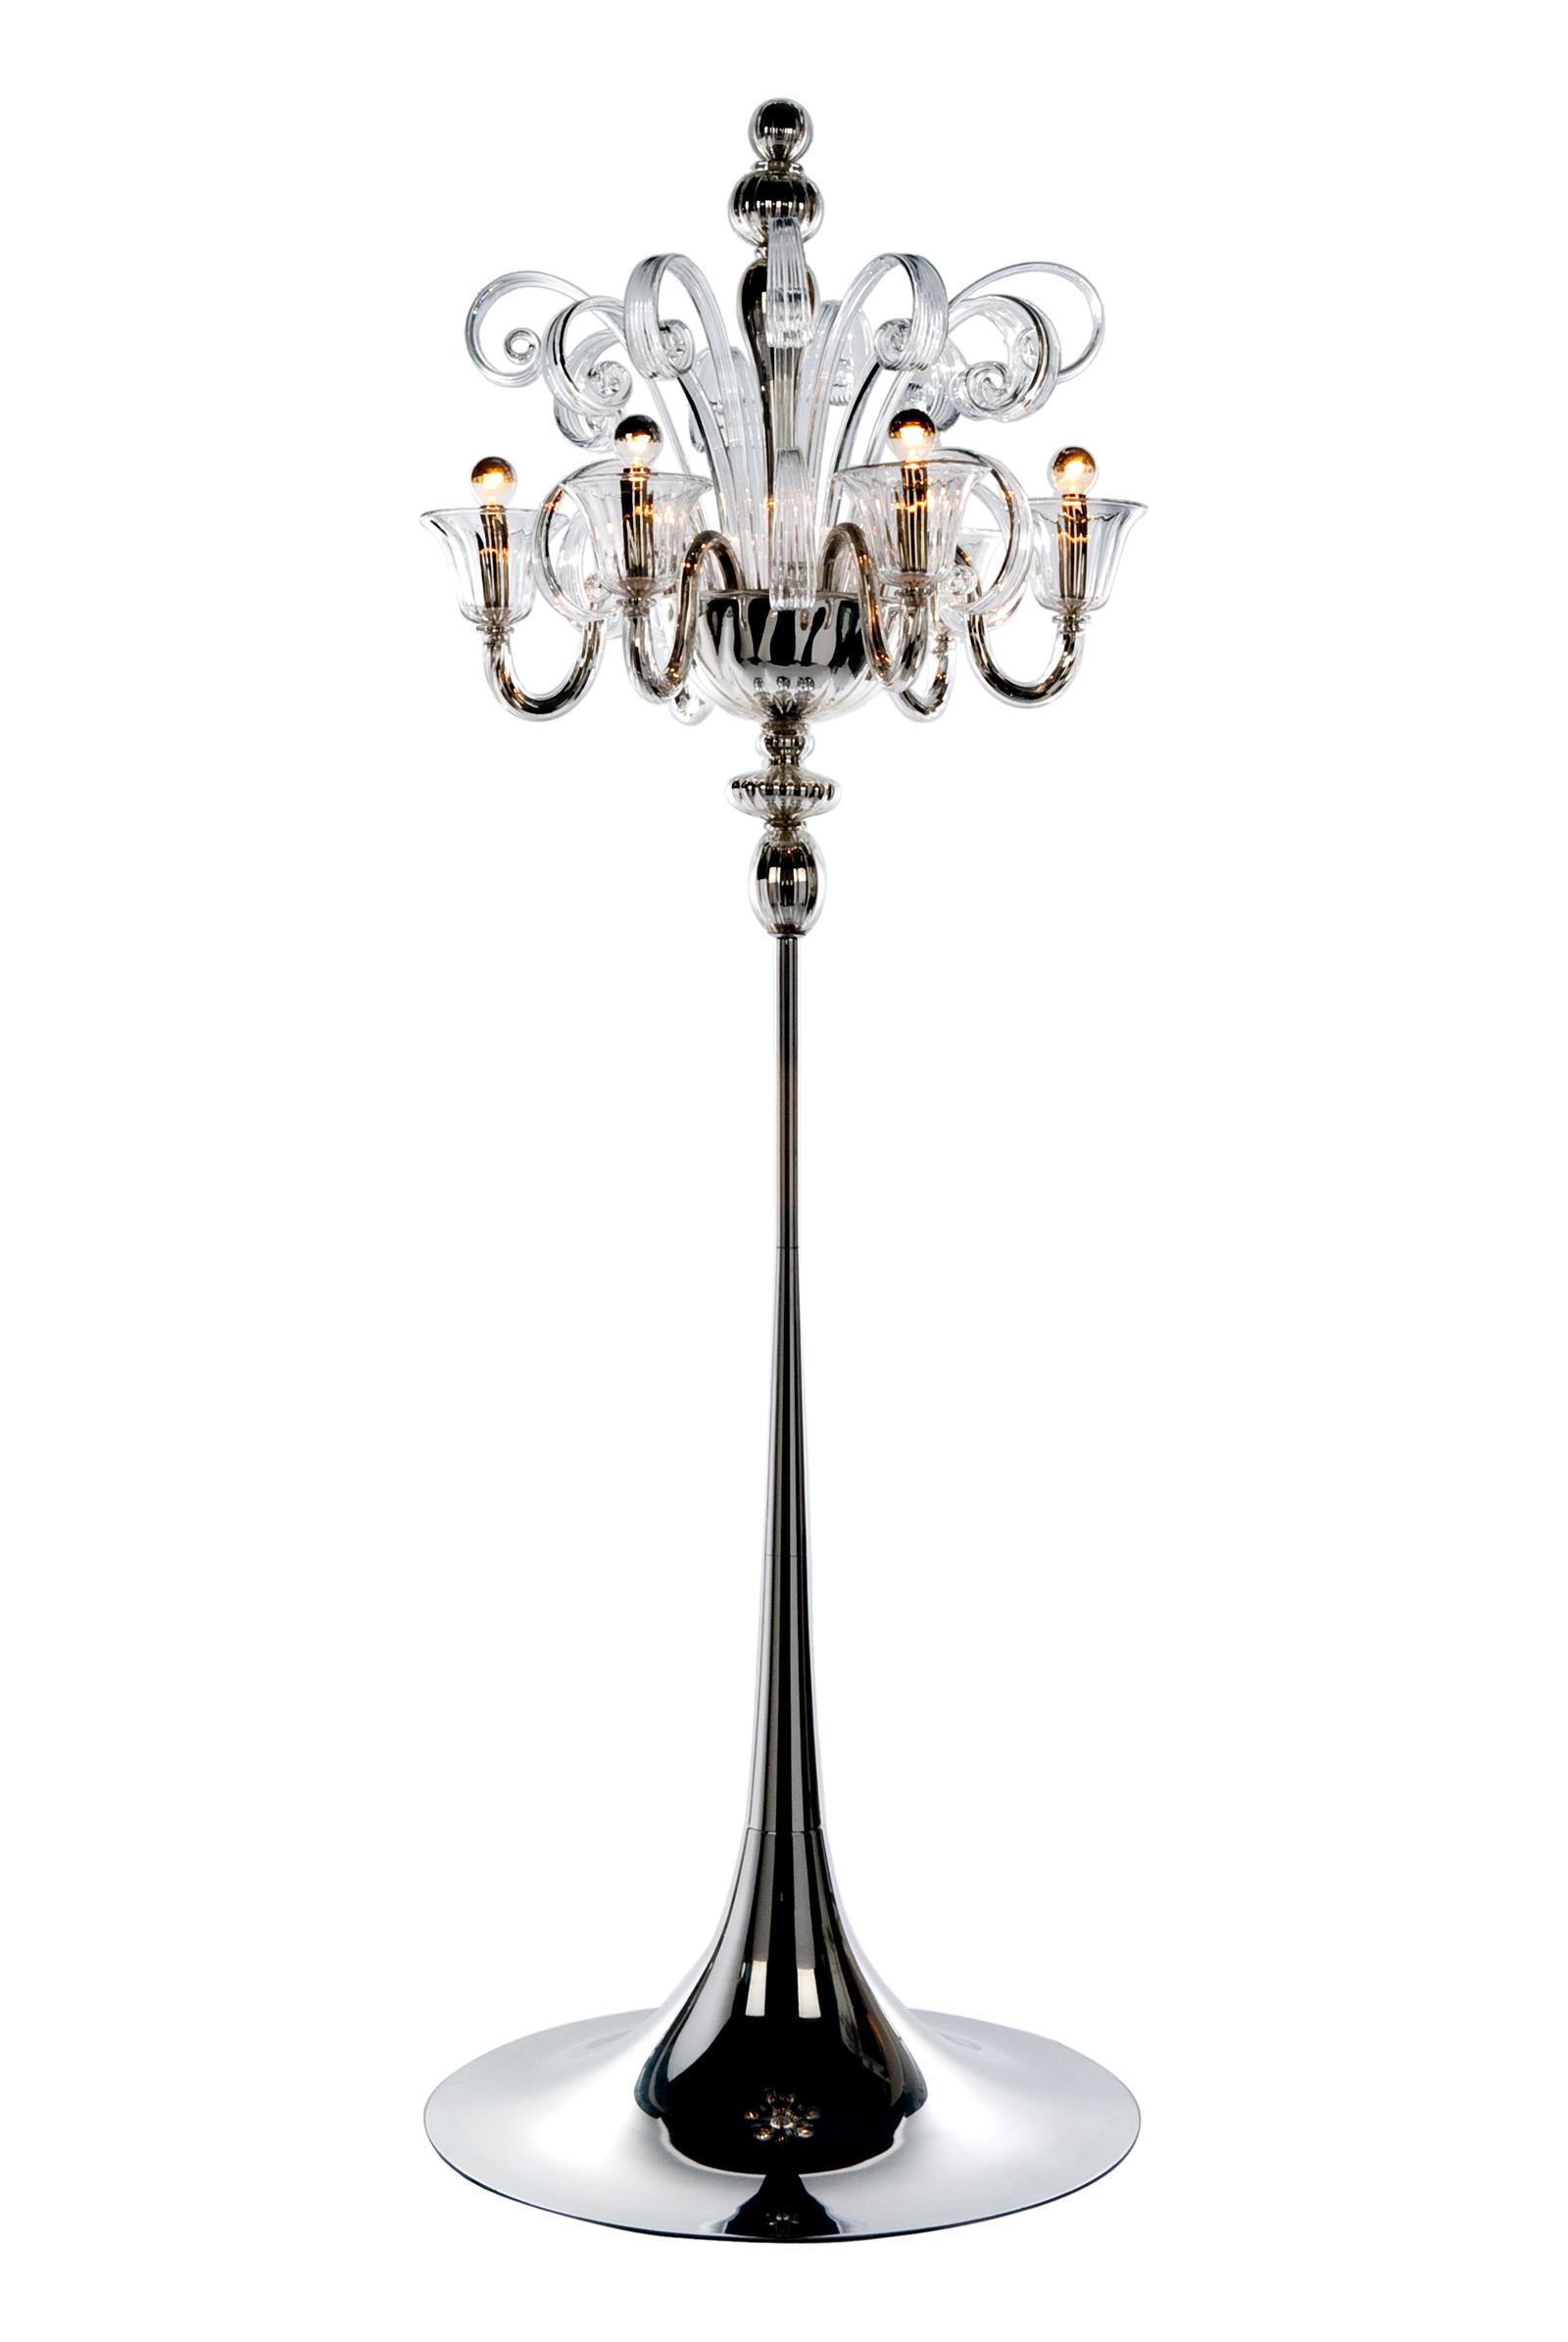 idole-floor-lamp-lampadaire-ute-wegener-didier-masquida-veronese-11.jpg